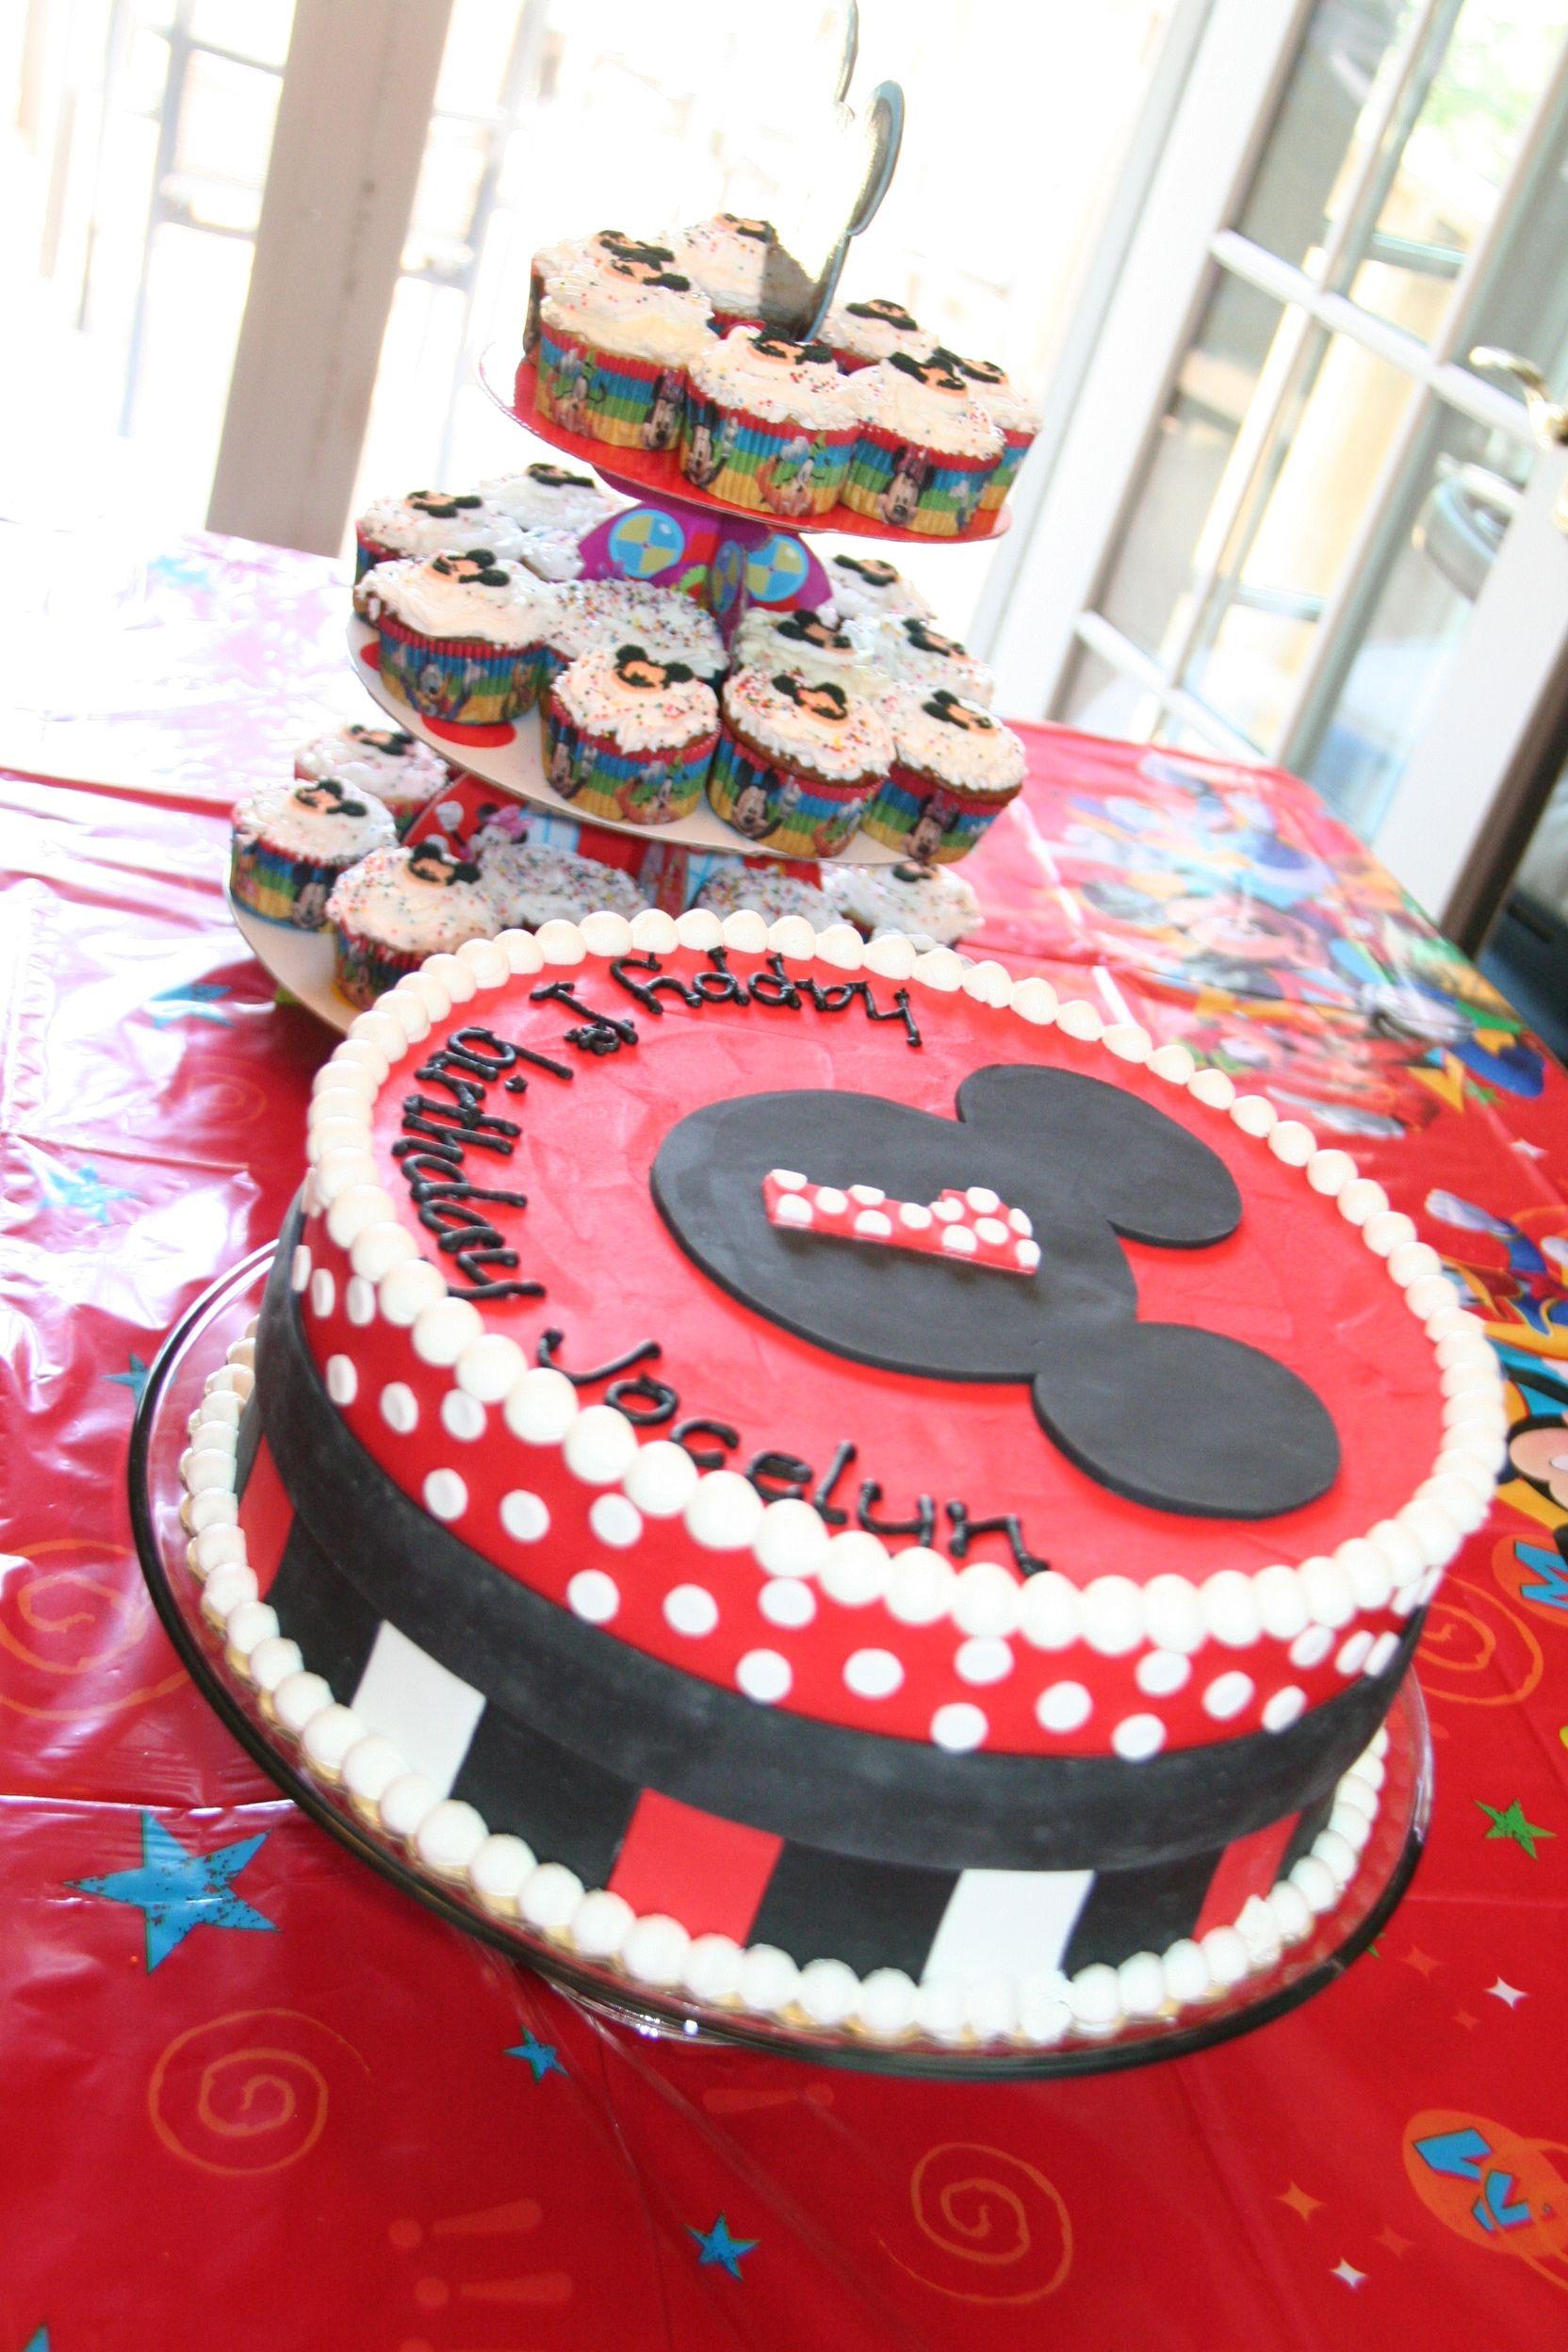 Custom cake from sweet lucys bakery morristown nj